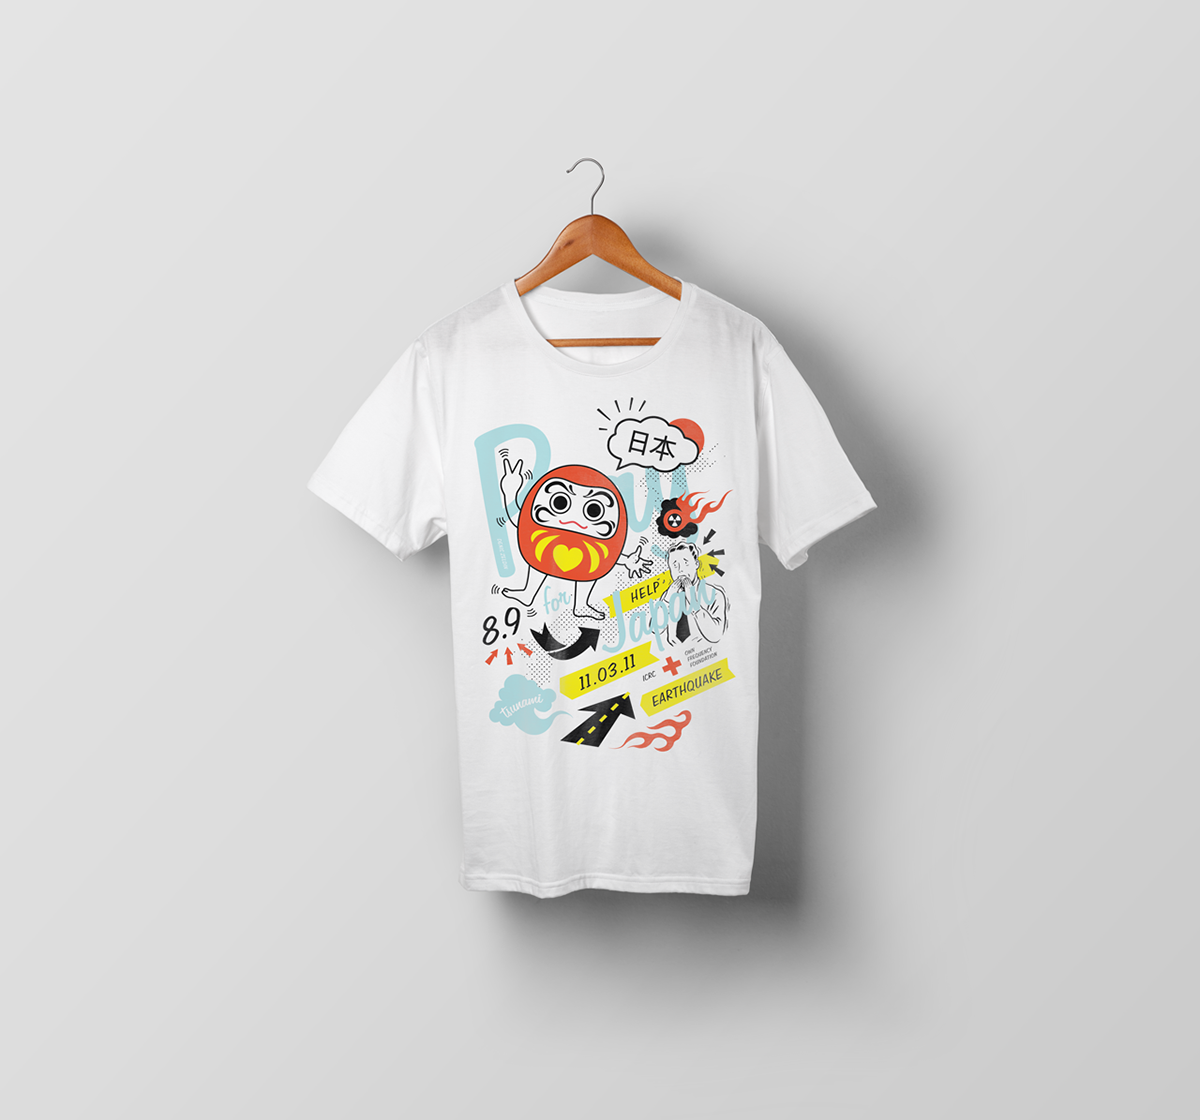 Printed Tee-shirts